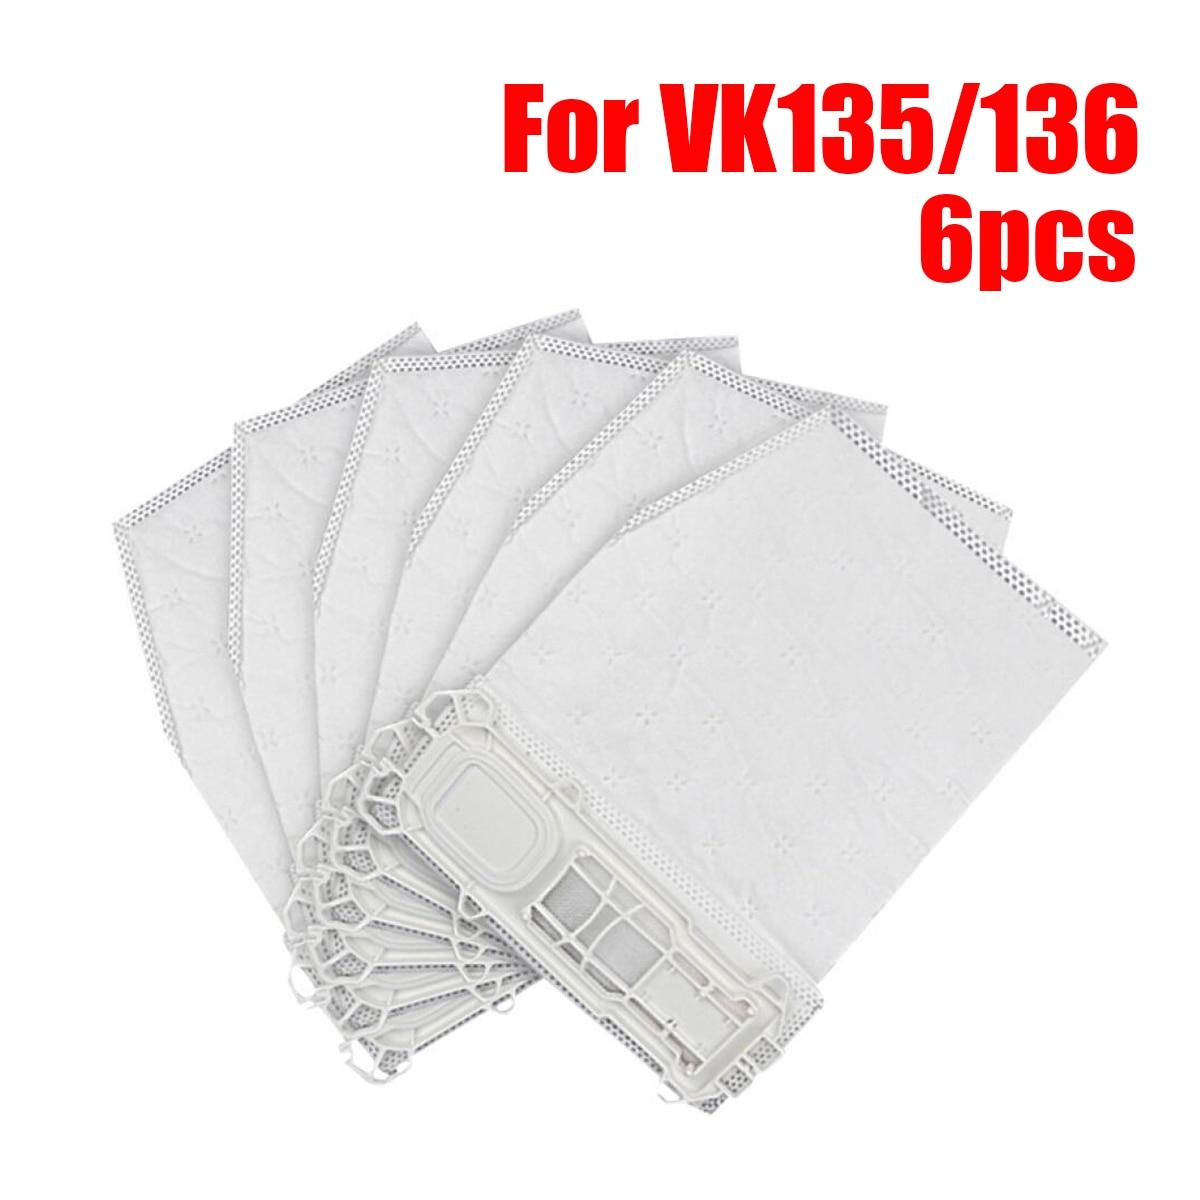 6pcs Vacuum Cleaner Bags Dust Bag for vorwerk VK135 VK136 Vorwerk Kobold Vacuum Cleaner Parts Home Appliance Accessoriess